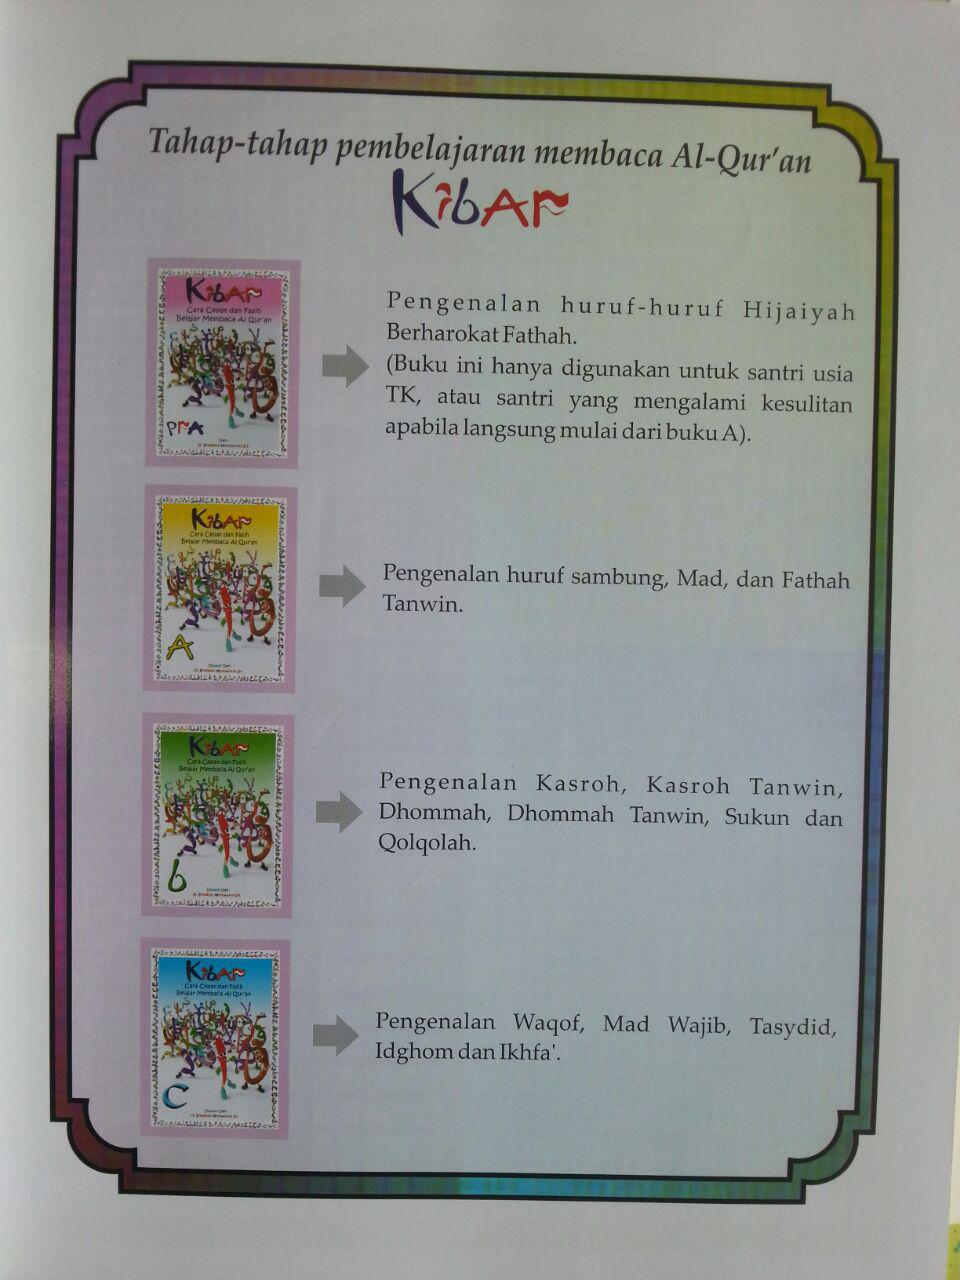 Buku Kibar Cara Cepat Dan Fasih Belajar Membaca Al-Qur'an Full Colour B5 isi